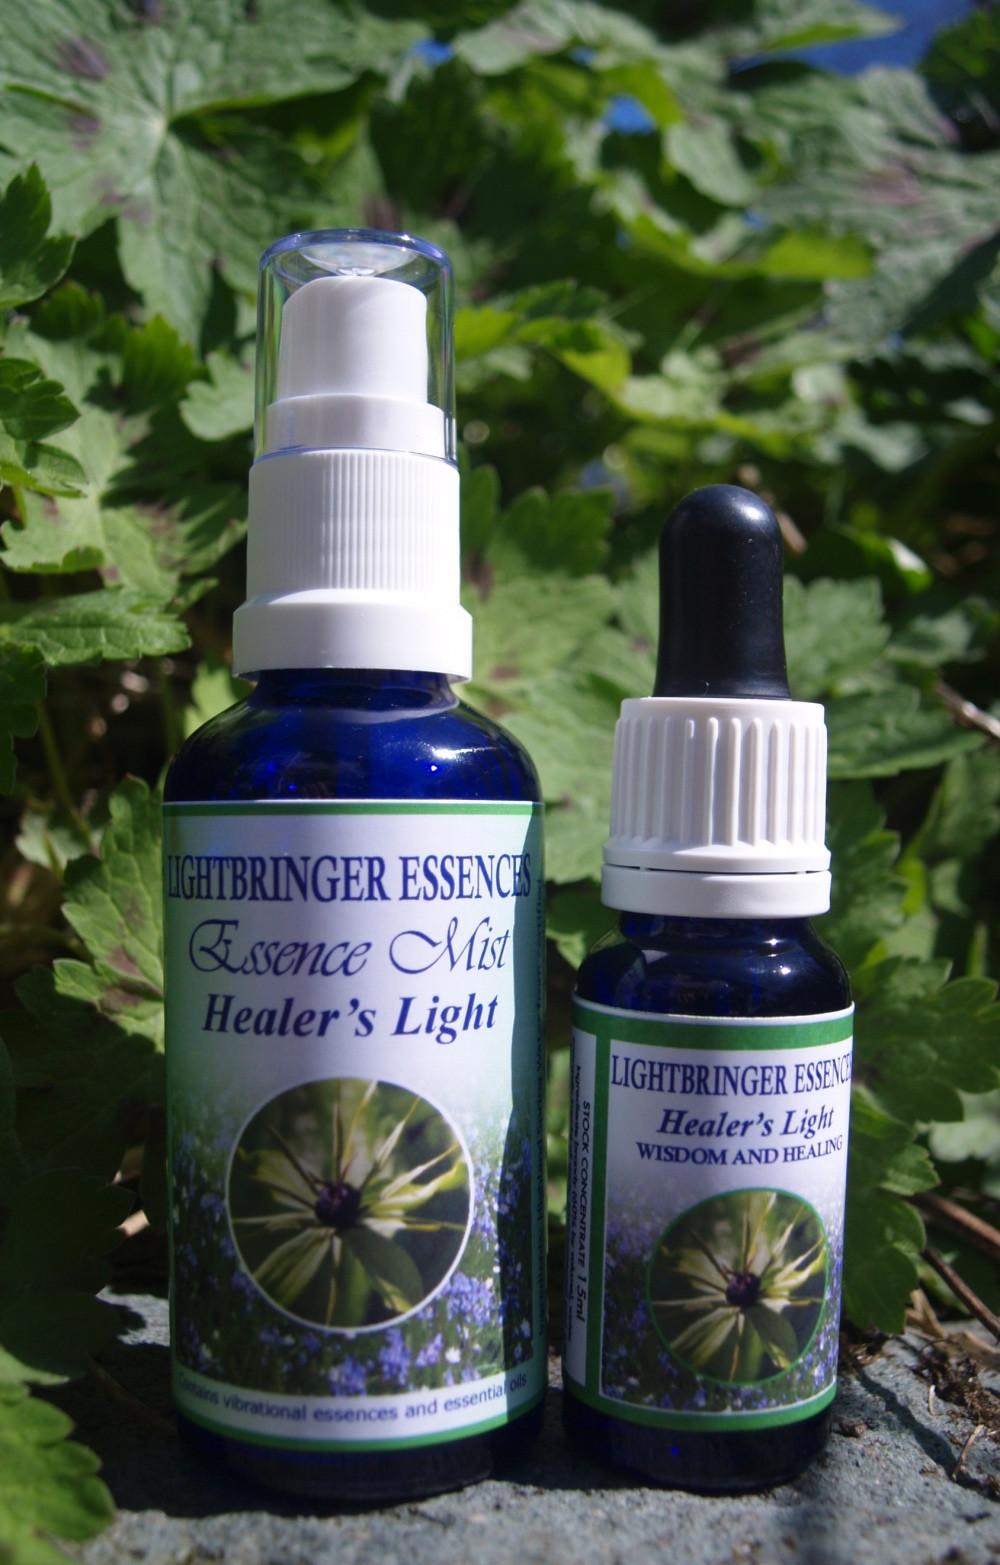 Healer's Light Essence Combination - alignment to our inner healer